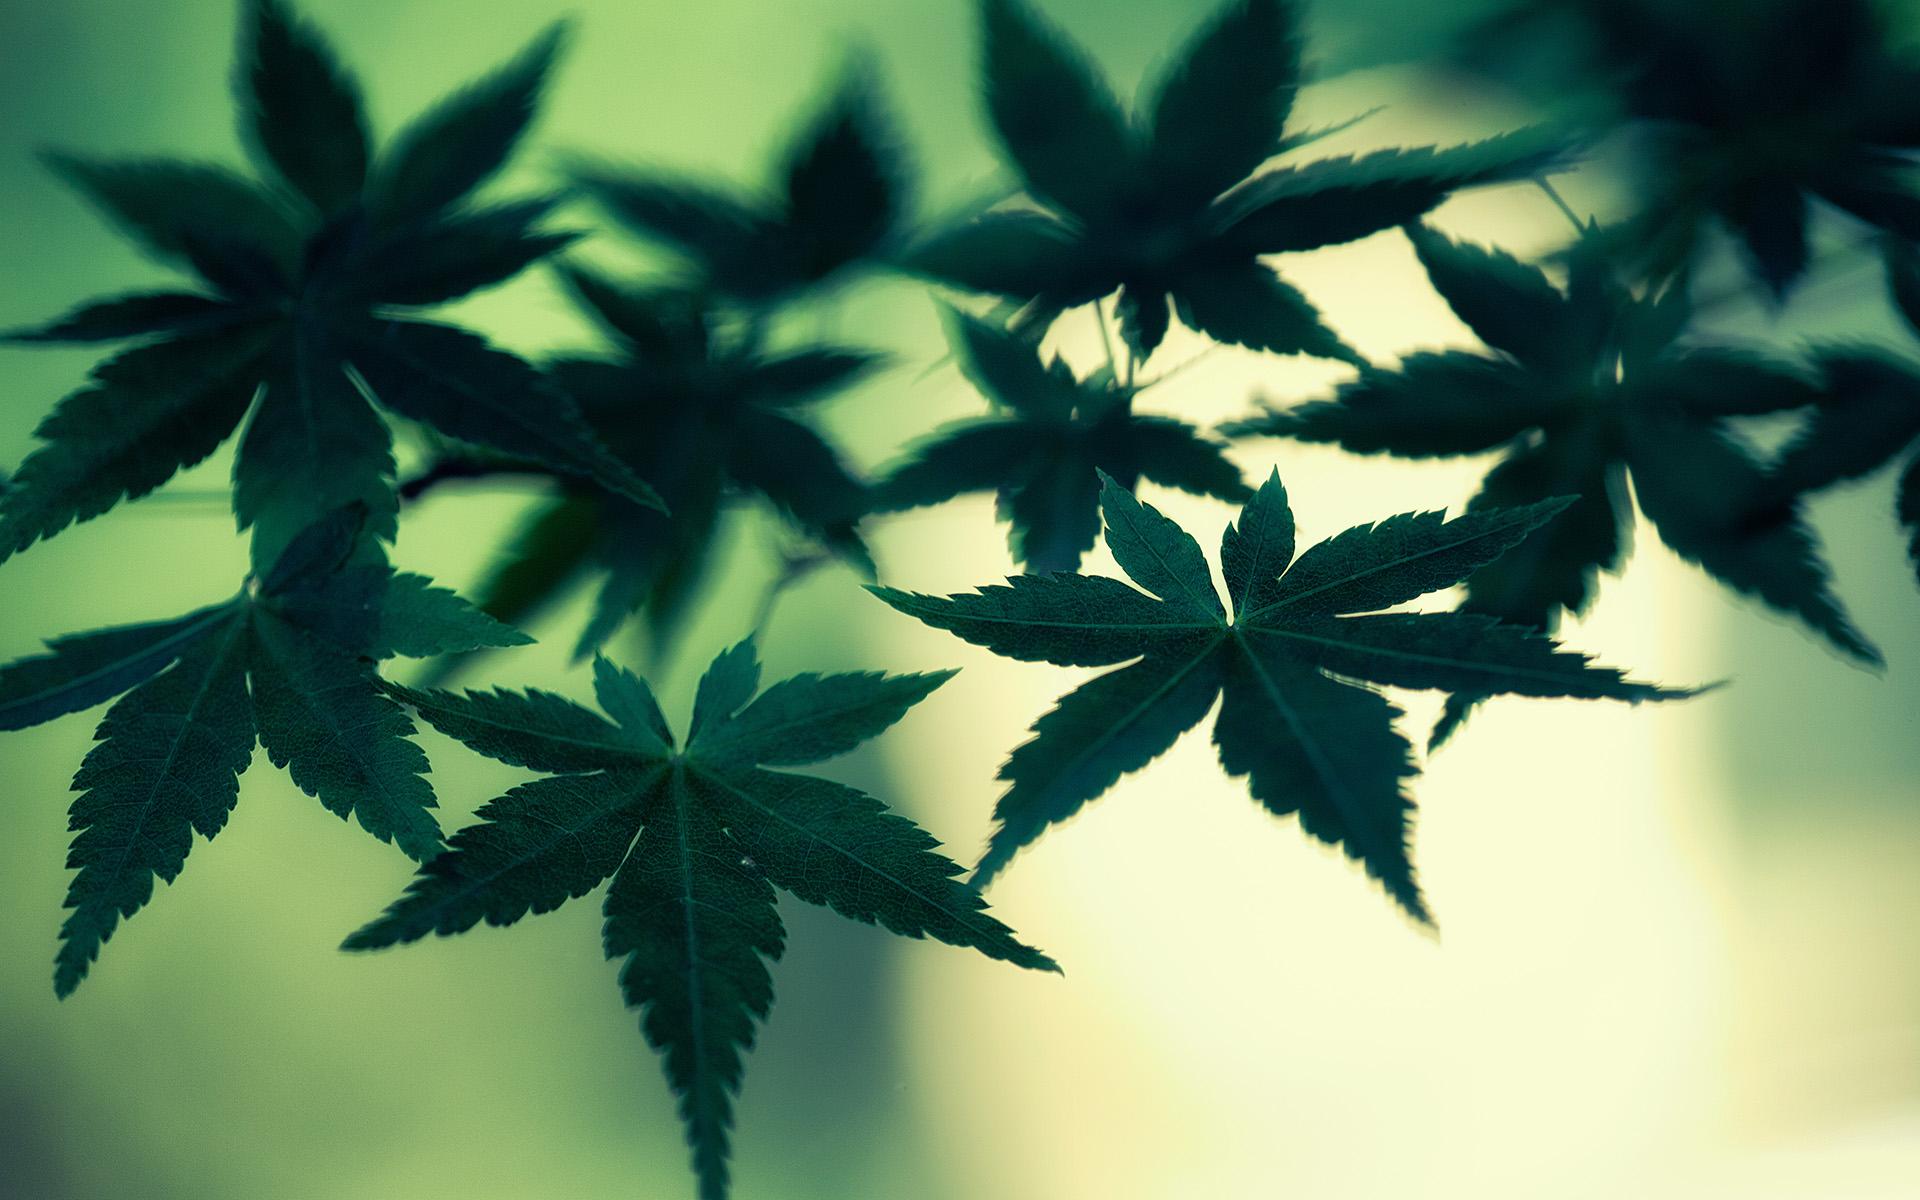 Marijuana Cannabis Leaves Green Macro weed wallpaper 1920x1200 1920x1200